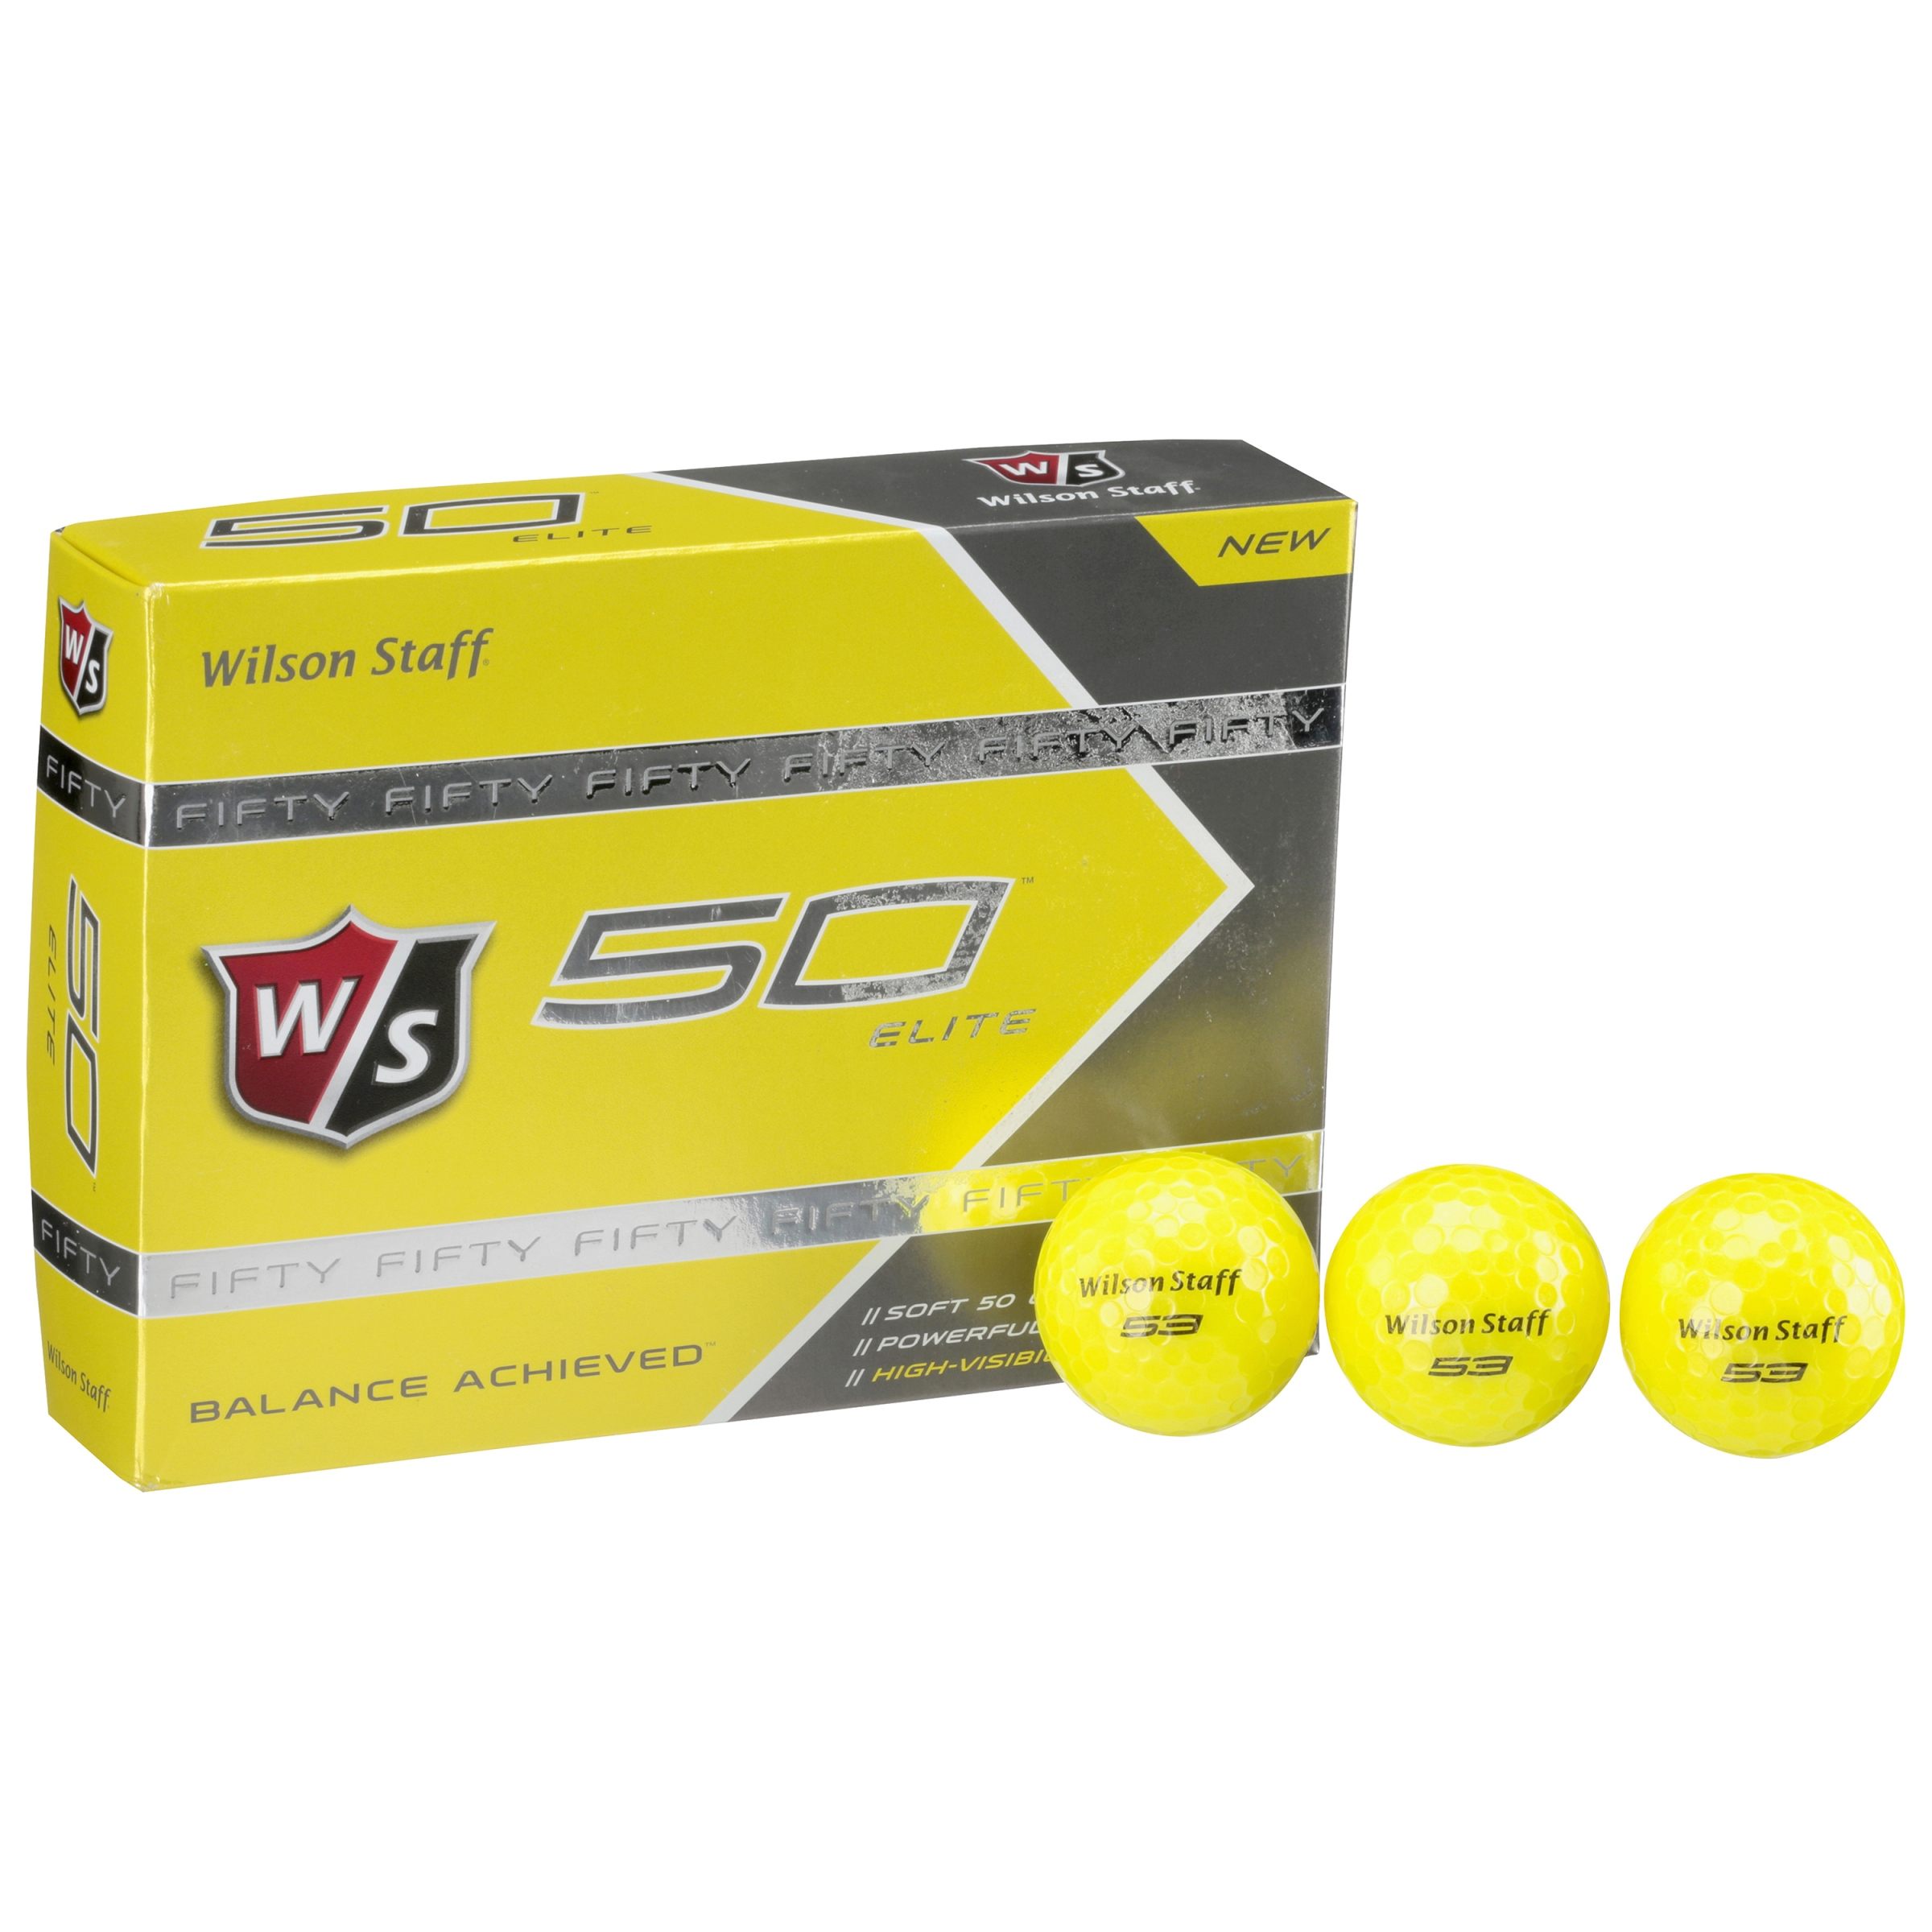 Wilson Staff 50 Elite High-Visibility Yellow Golf Balls 12 ct Box ...